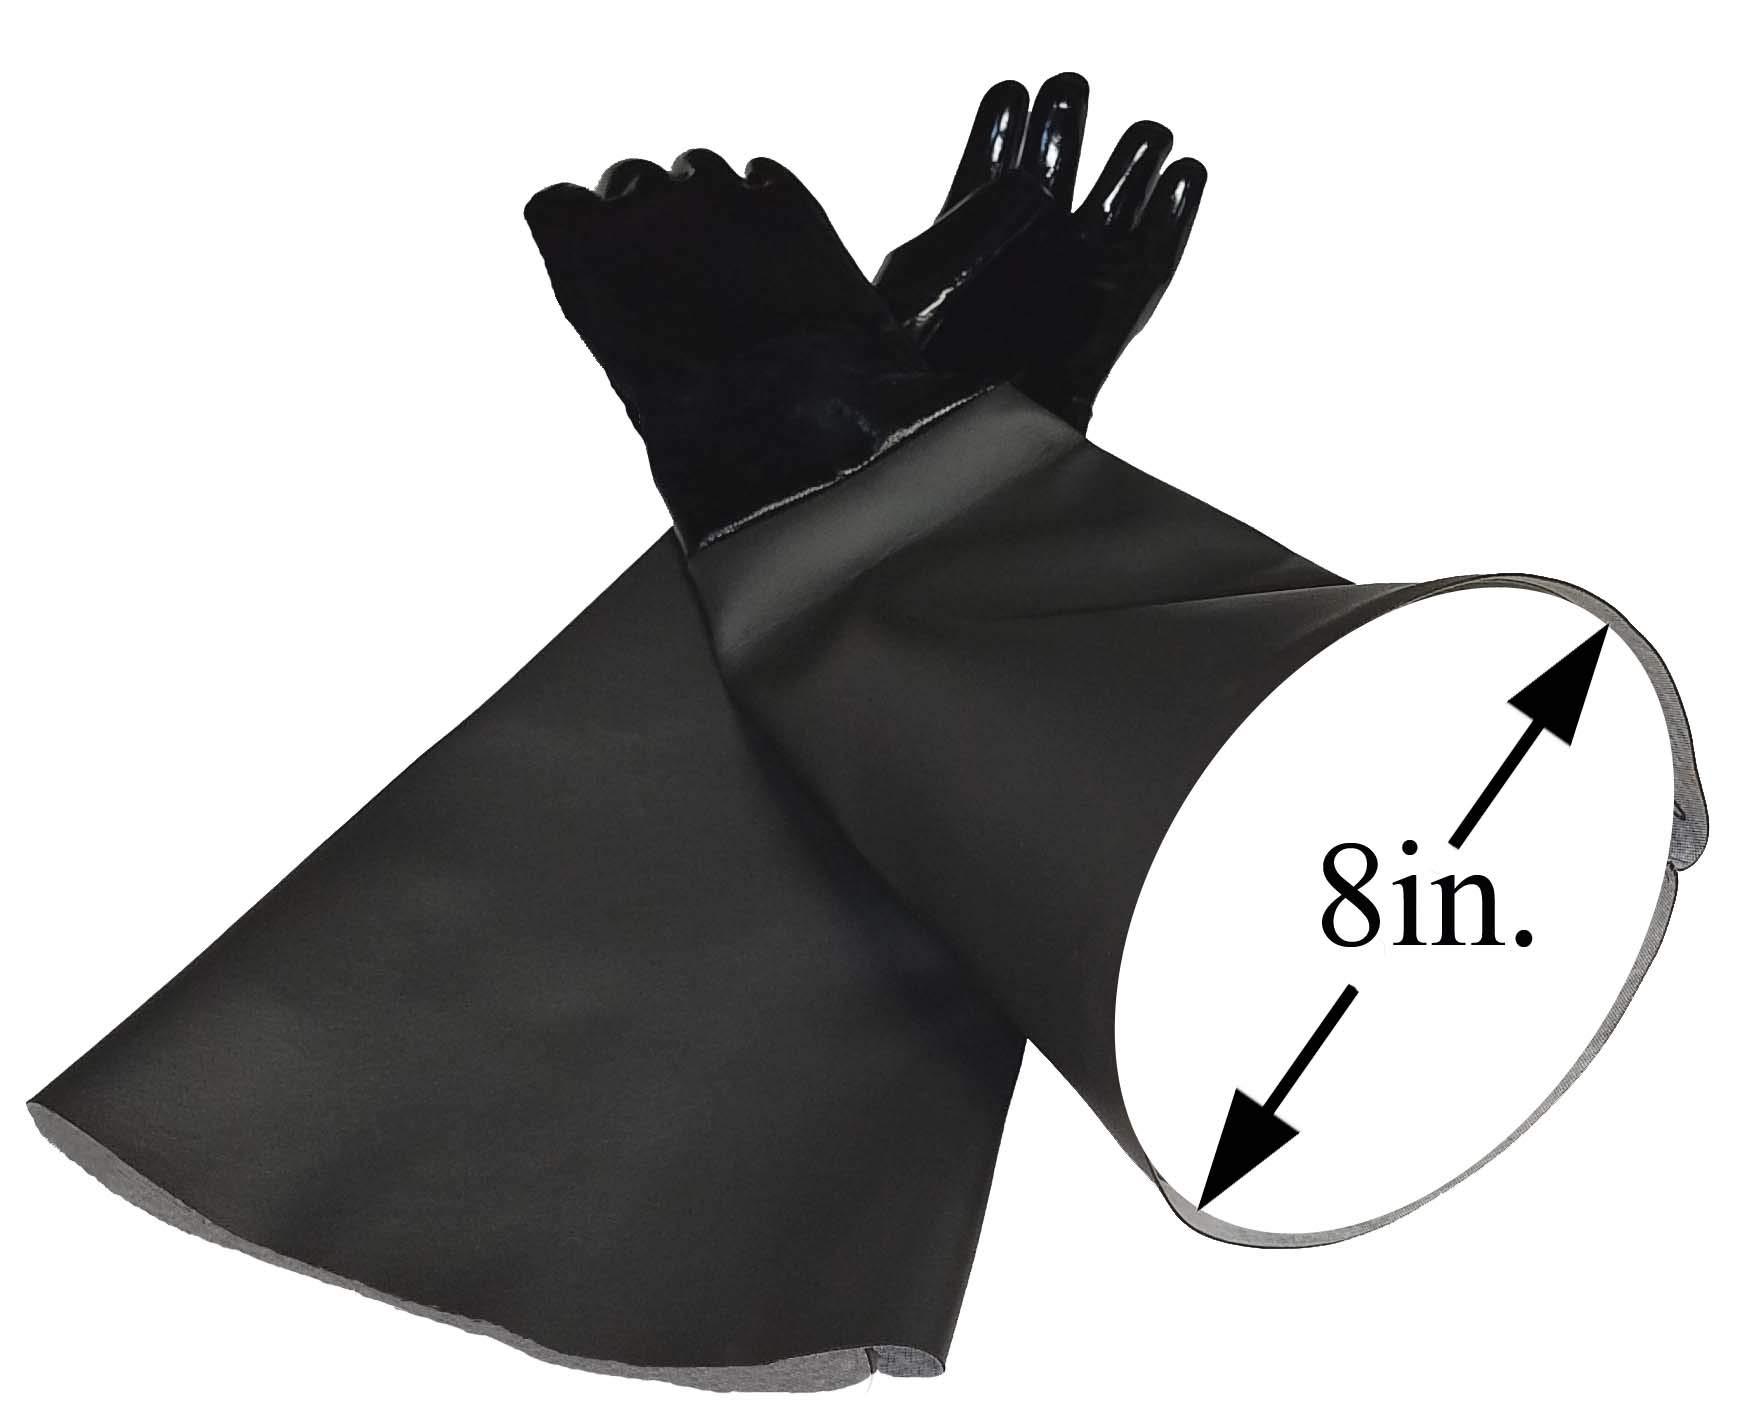 TUFF-Blast Neoprene Gloves for Sandblasting Sandblaster Sand Blast Cabinet - 8'' x 26'' Made in USA by TUFF-Blast